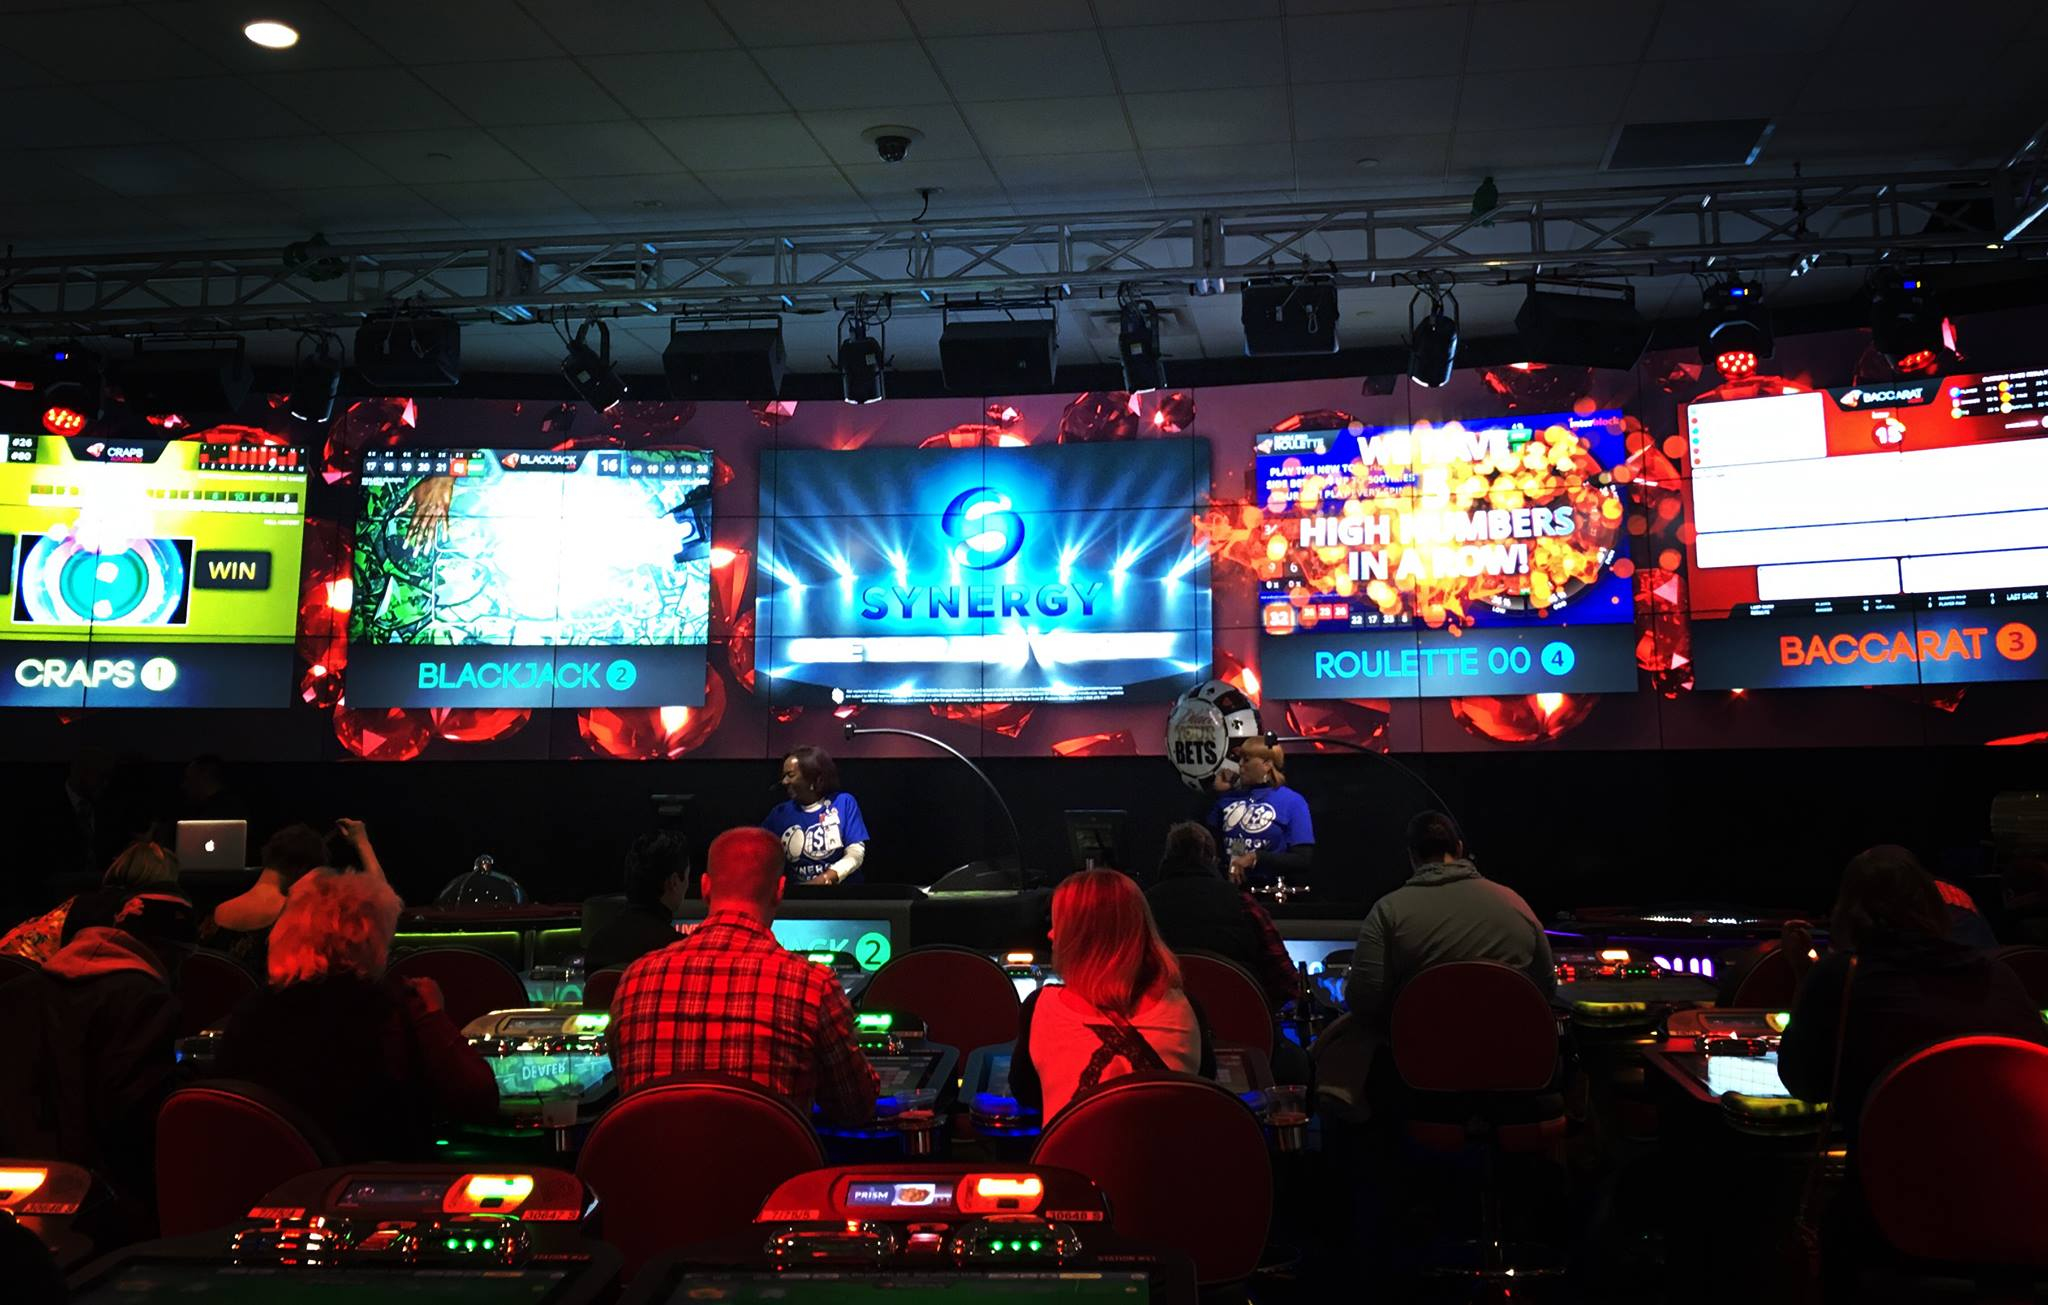 Jack Cleveland electronic gaming arena